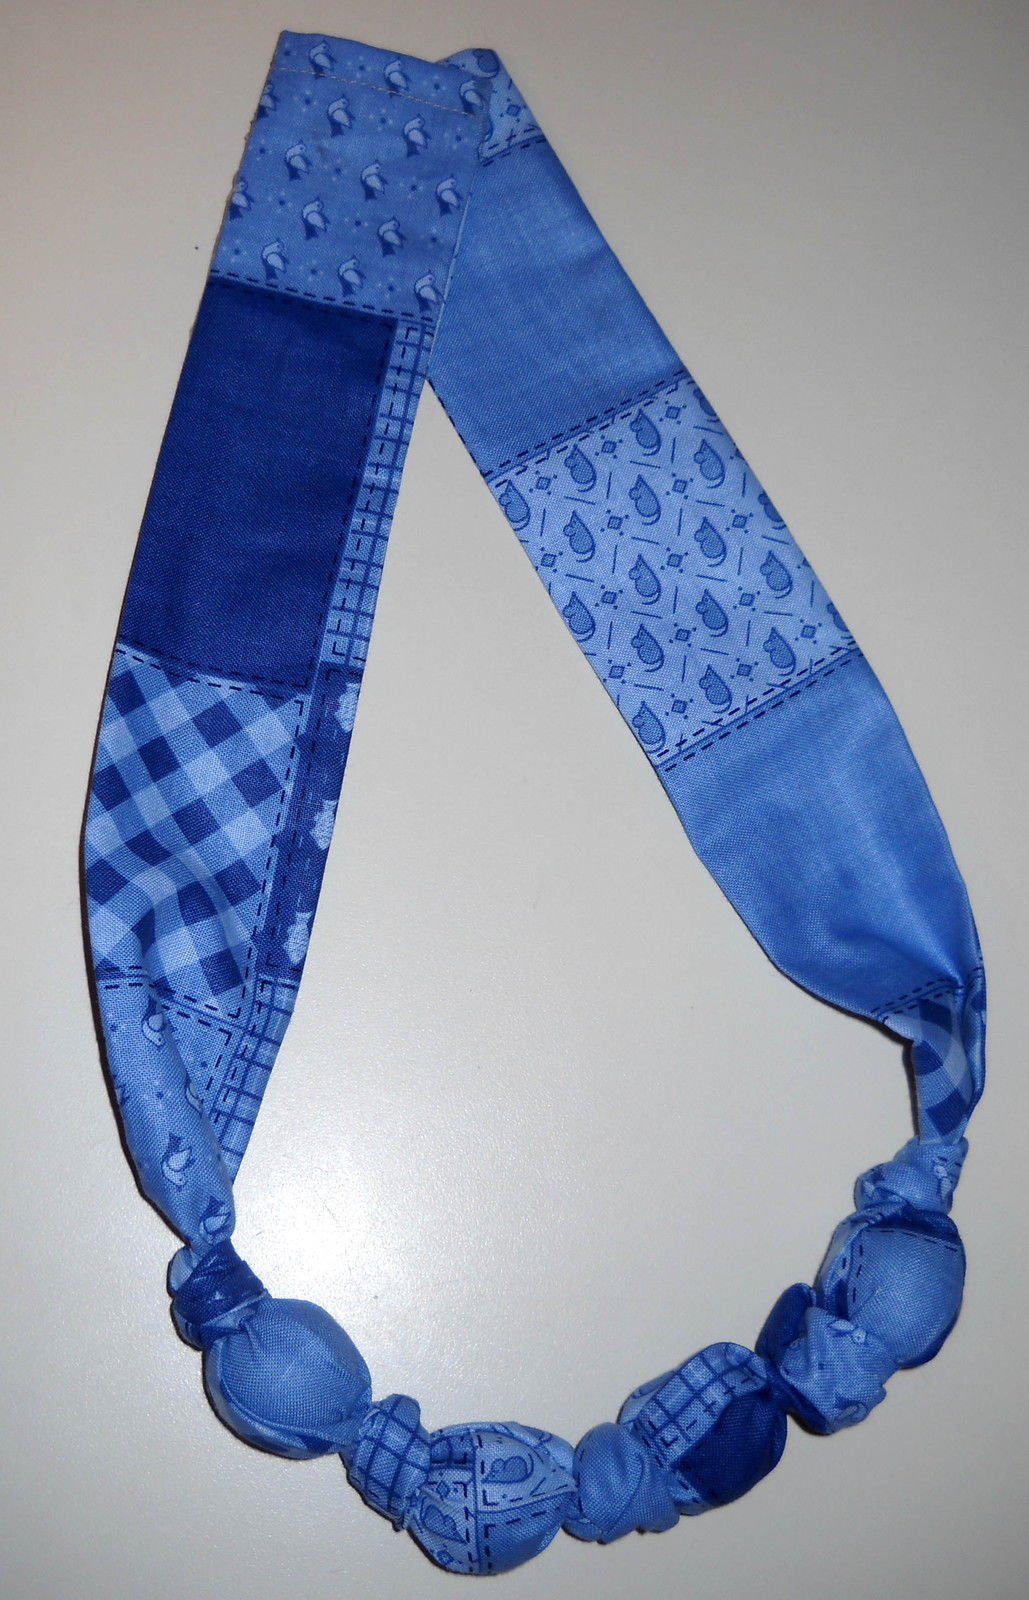 Fabric Knot Statement Necklace - Cornflower blue on bluie patchwork image 3